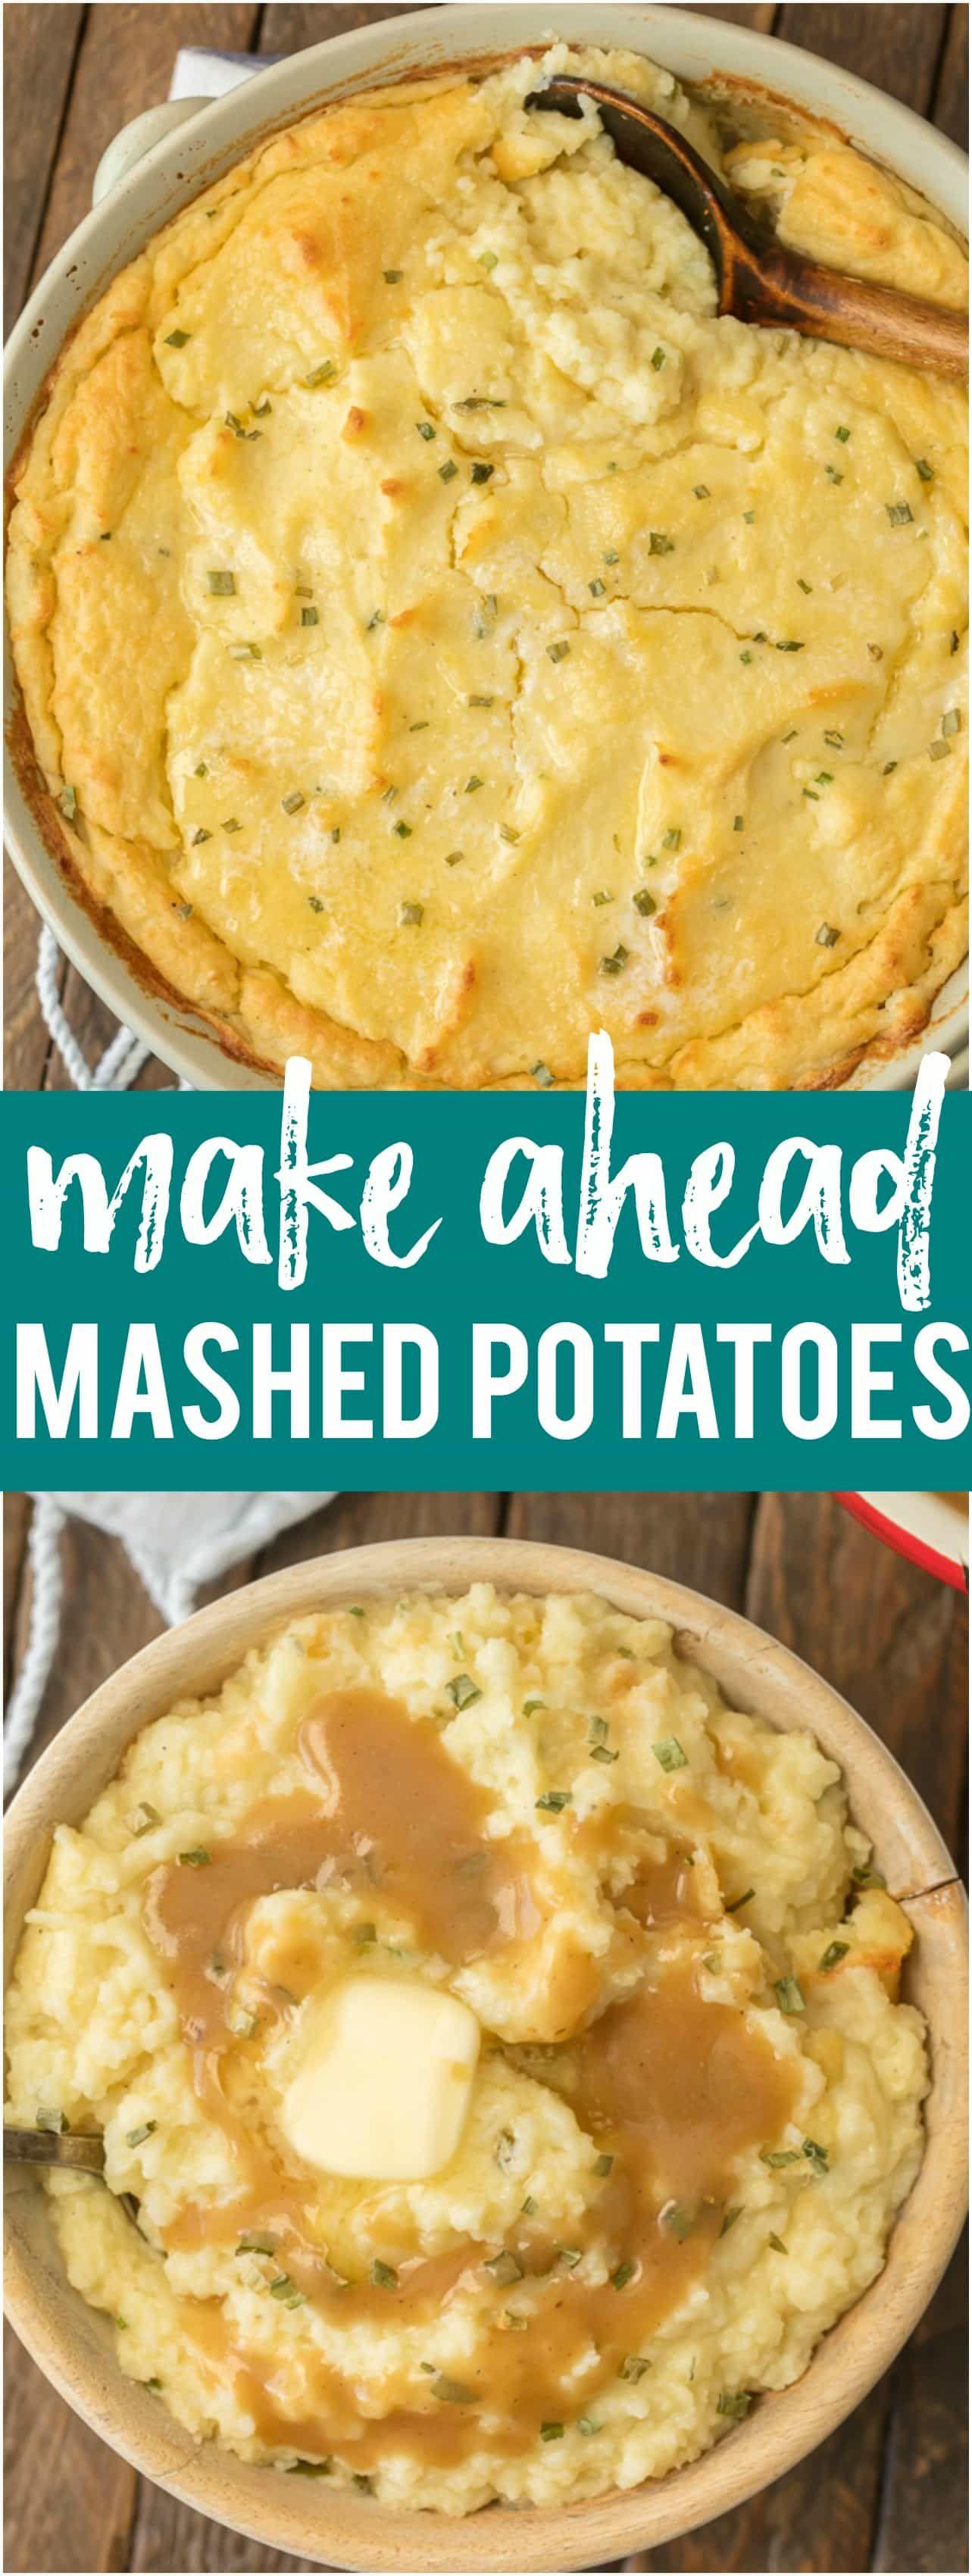 Make Ahead Mashed Potatoes   Recipe   Recipes I Want to ... - photo#41